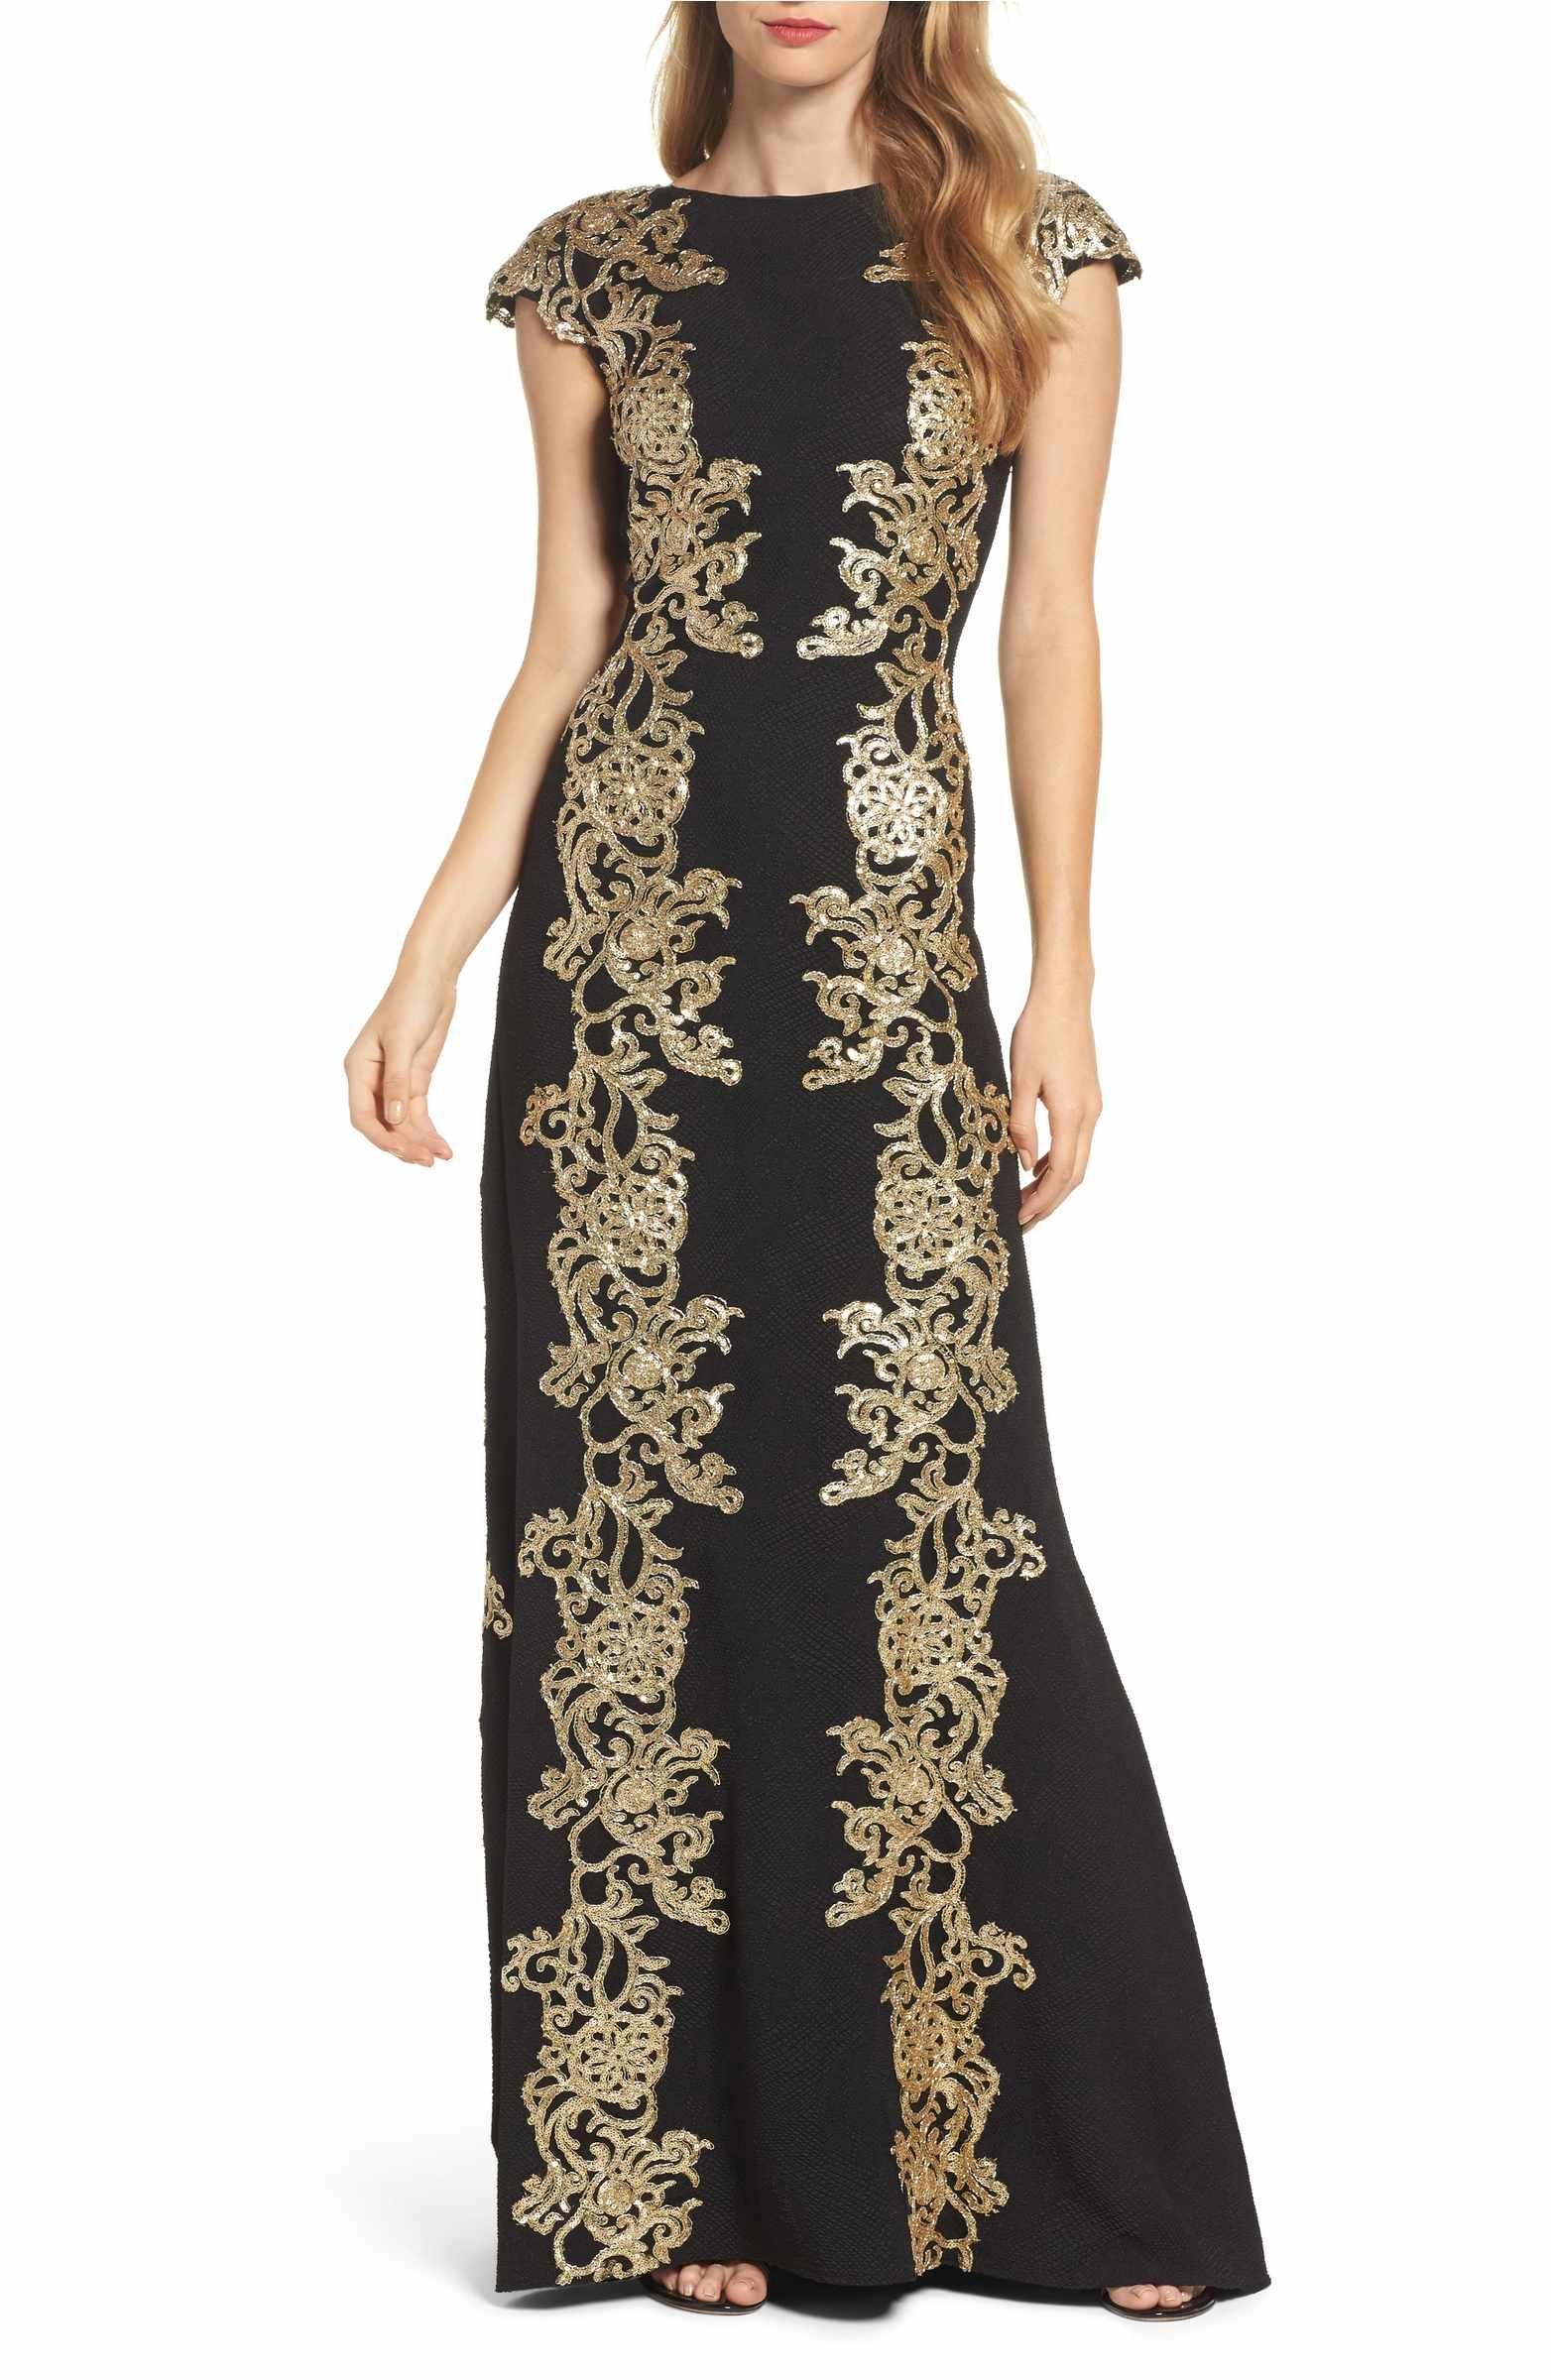 c562496eba8 Main Image - Tadashi Shoji Sequin Appliqué Textured Crepe Gown ...